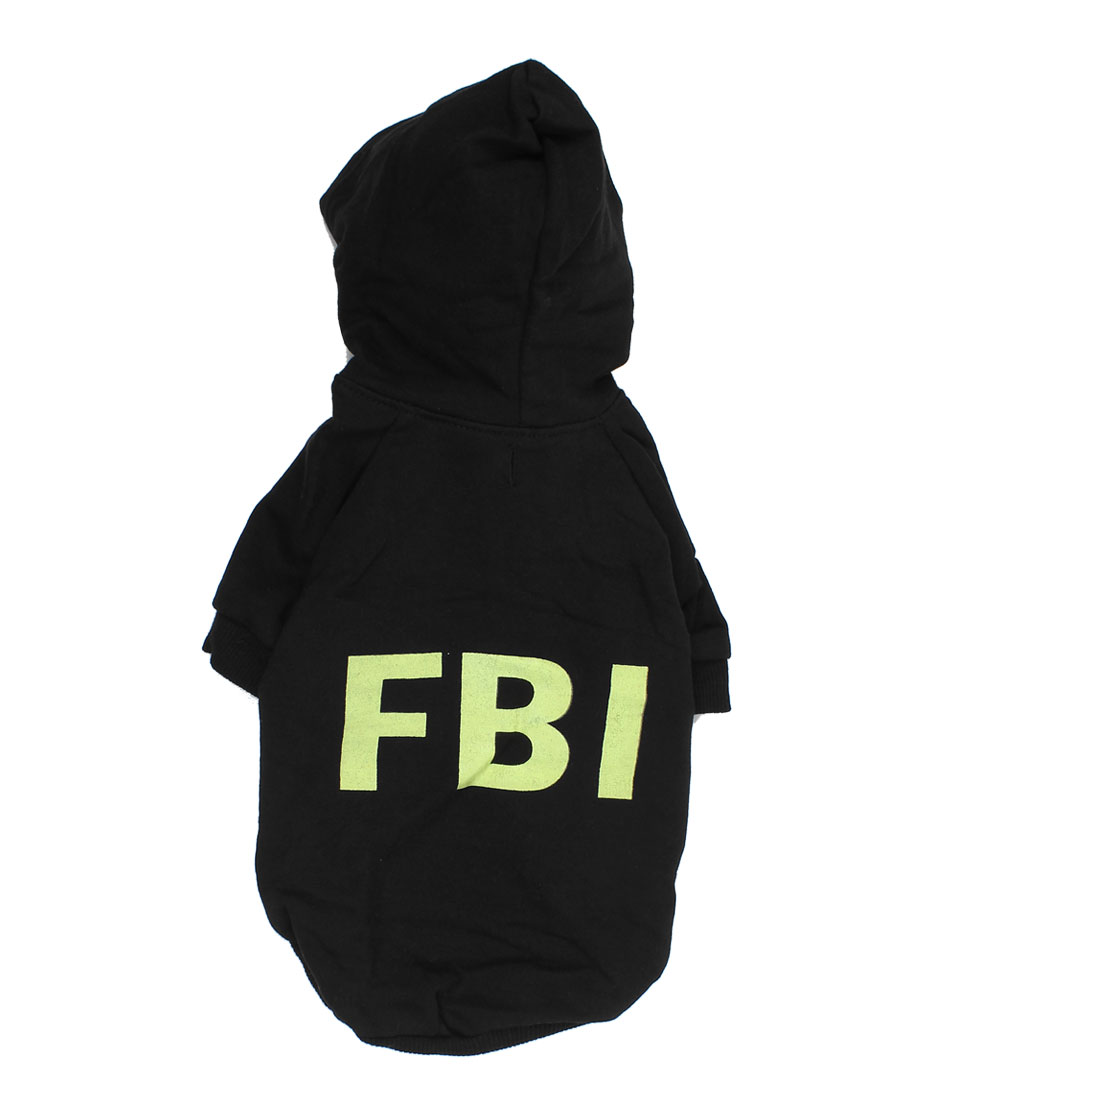 FBI Pet Doggie Yorkie Autumn Clothing Hoodie Coat Apparel Costume Black Size M